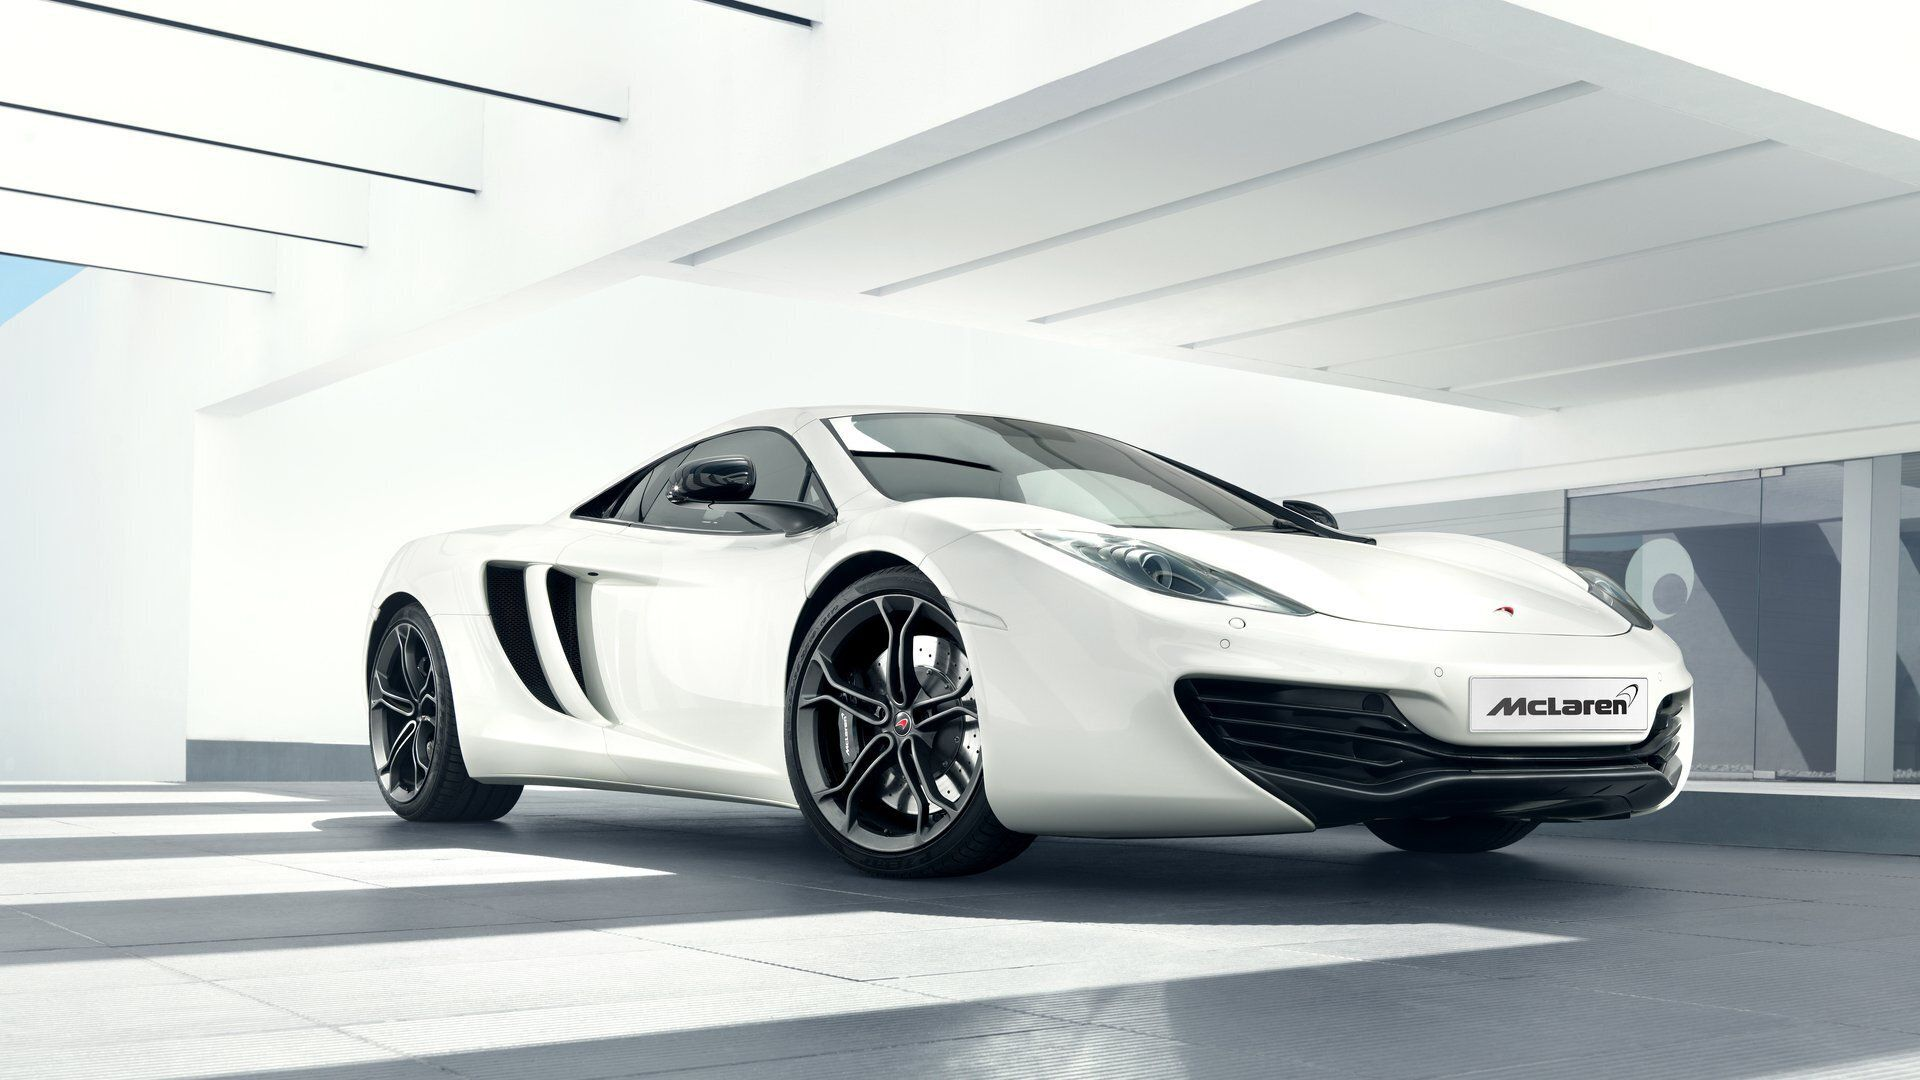 McLaren Automotive 12C